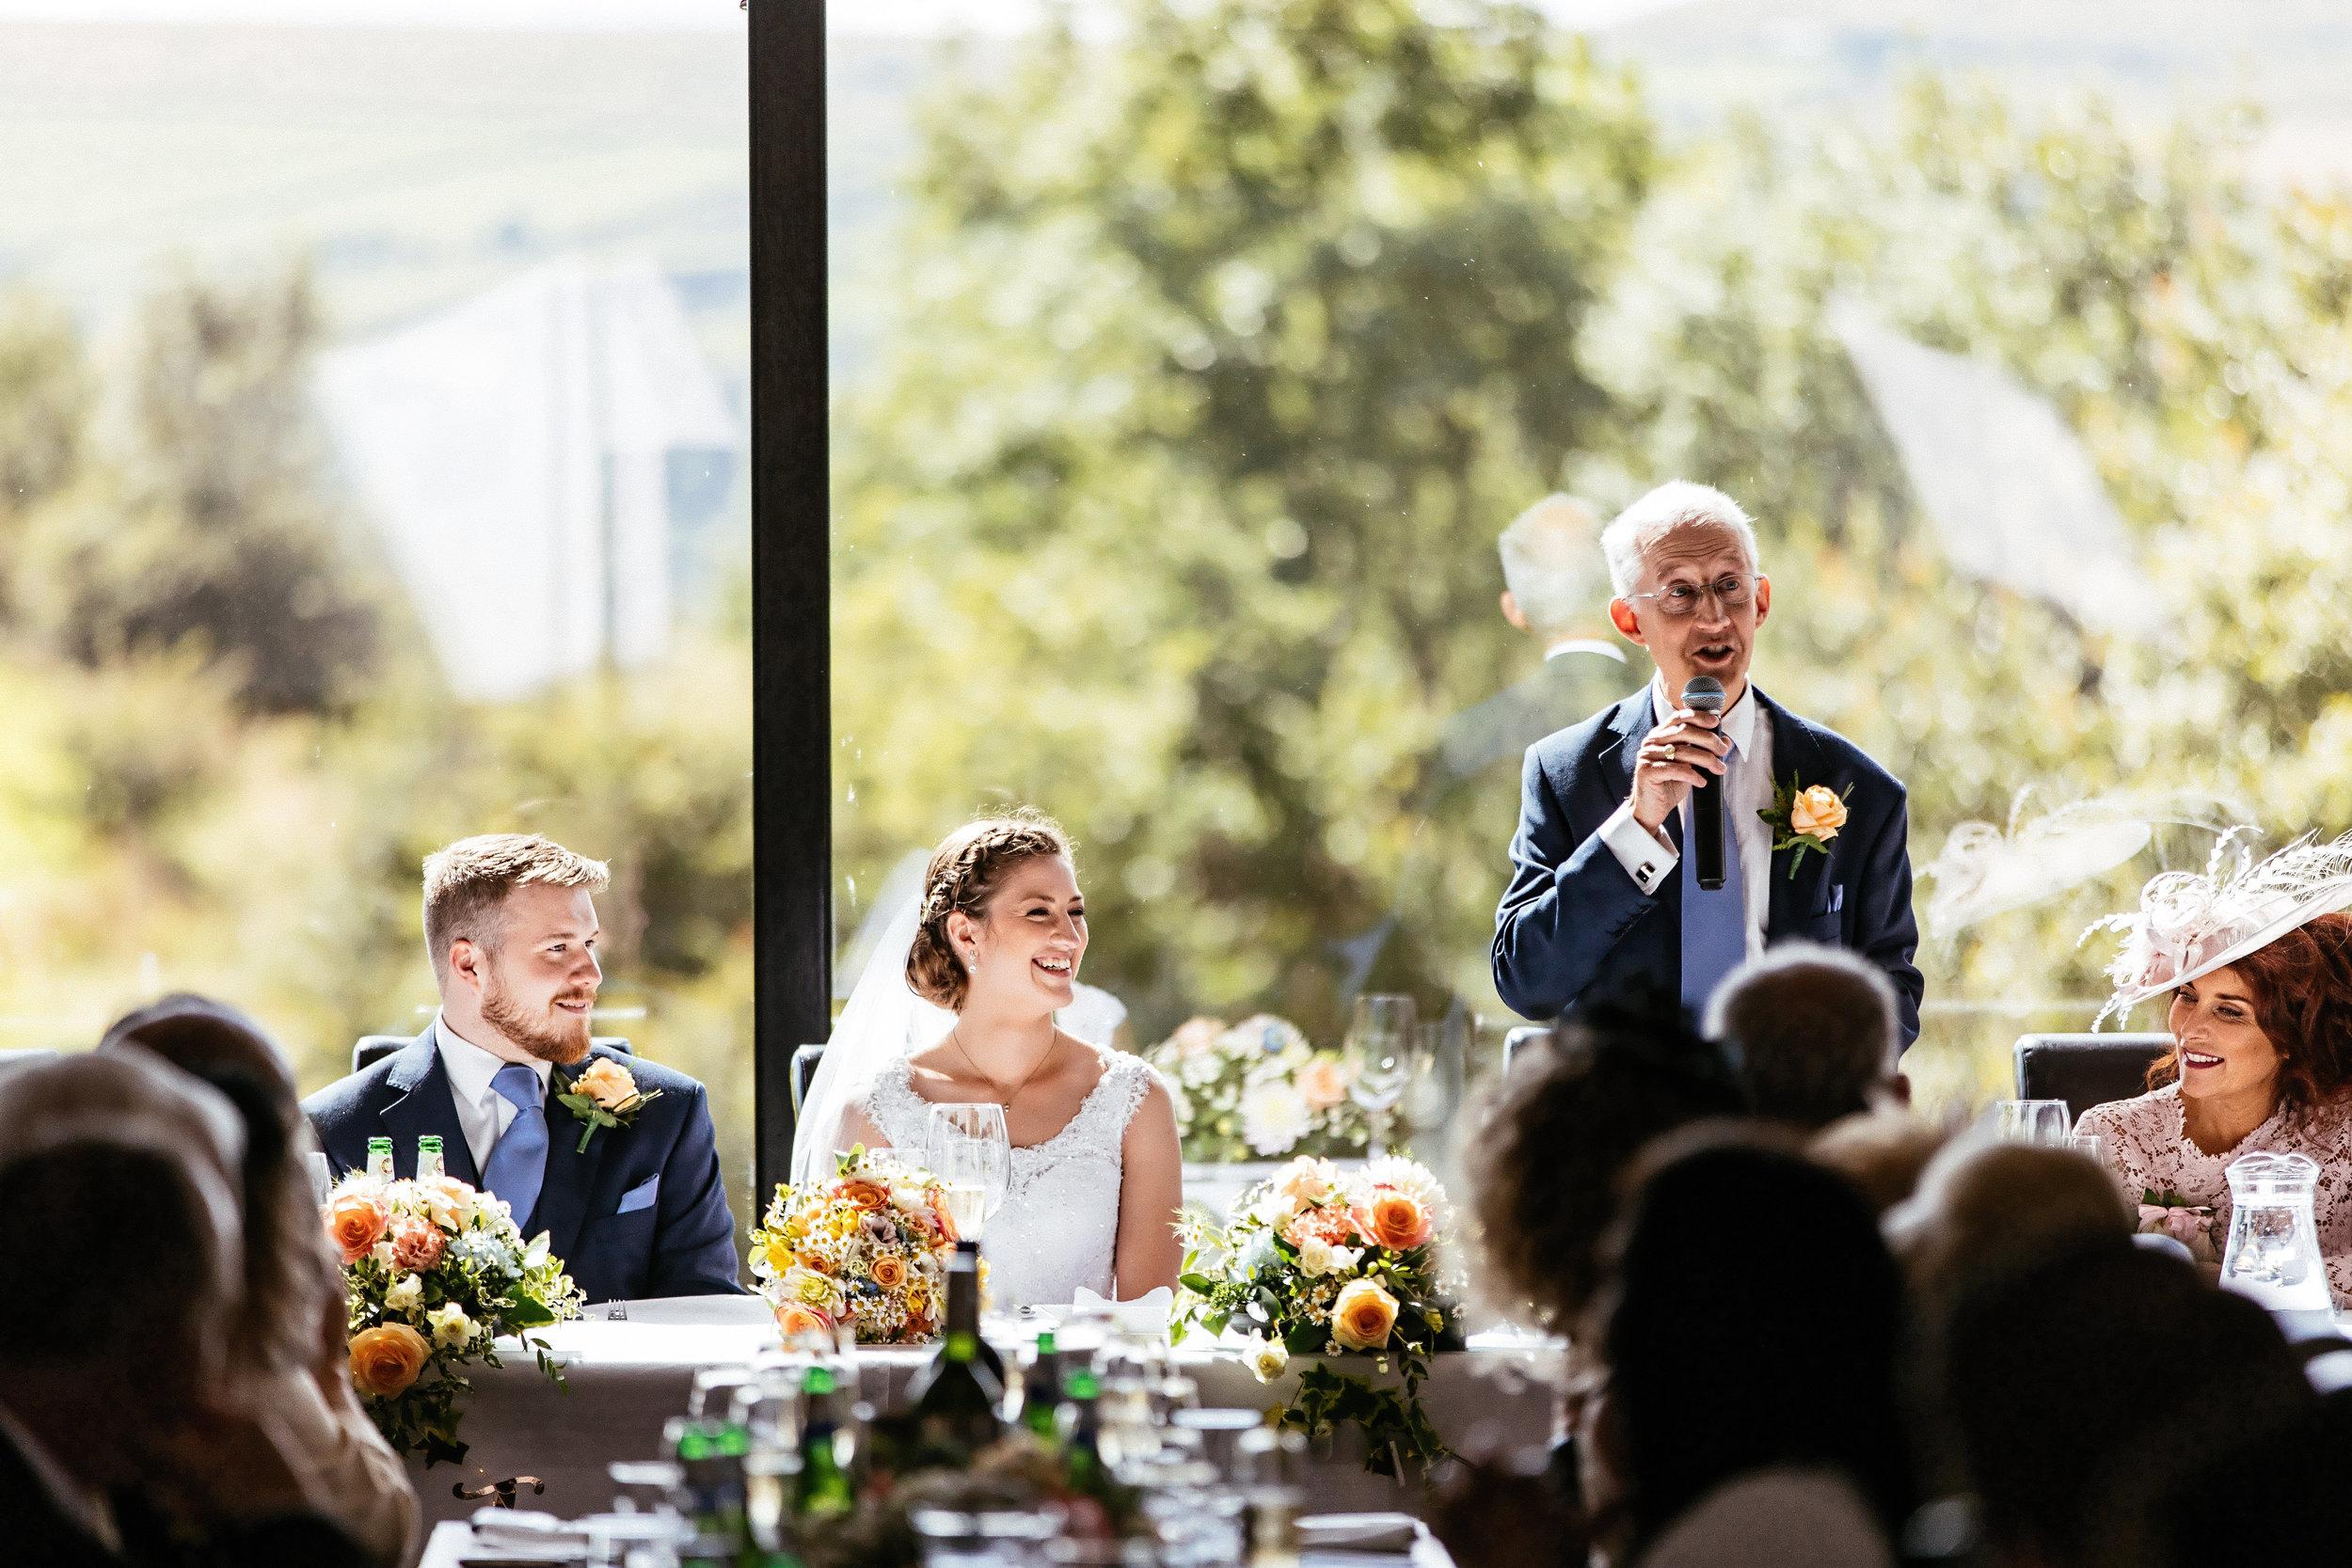 Kathryn-and-Mike-Wedding-Highlights-77.jpg